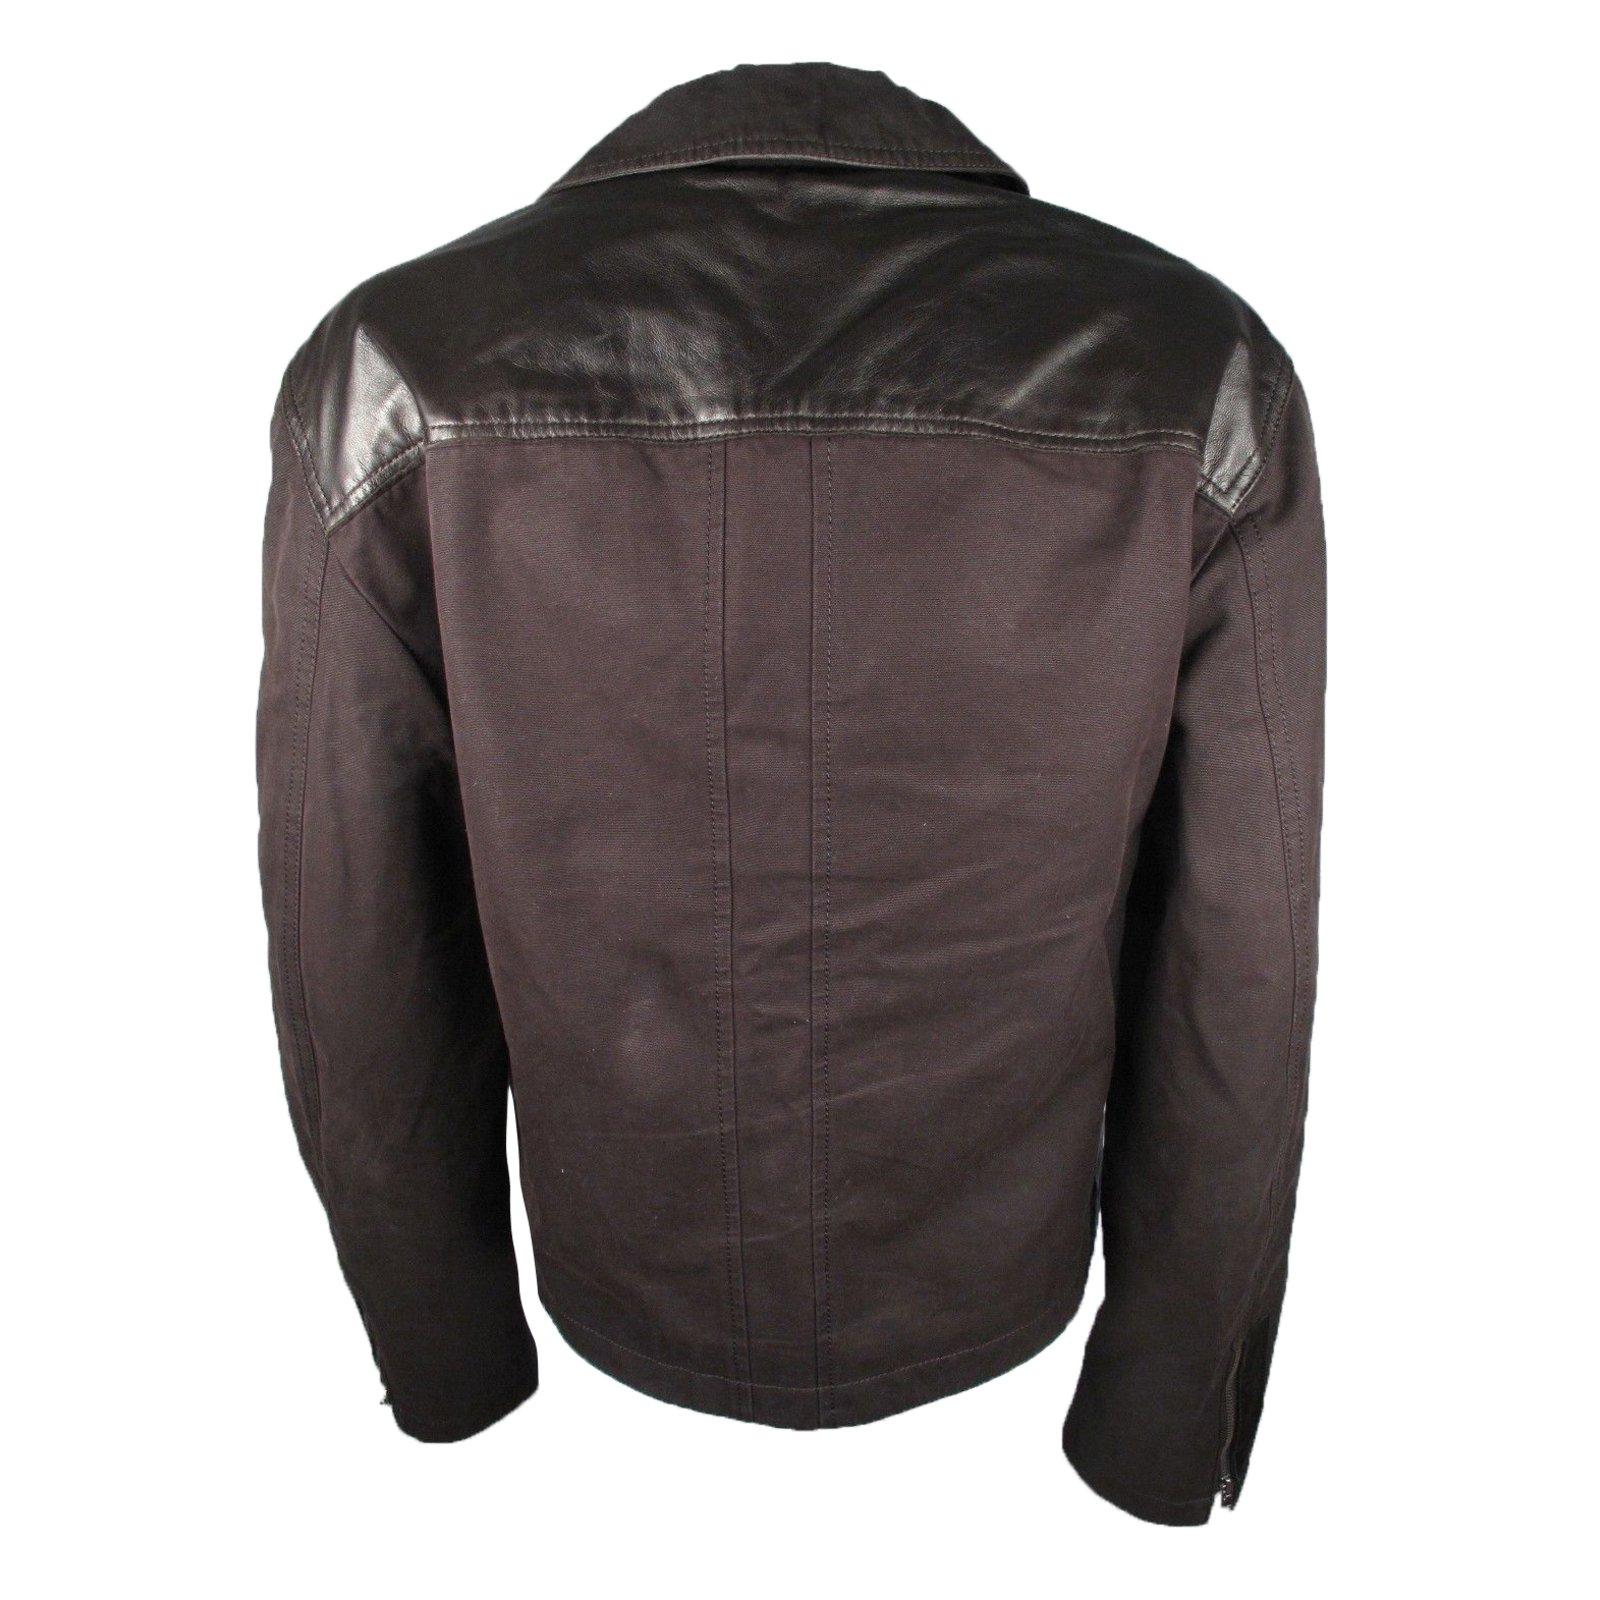 manteaux homme elie tahari veste en cuir et toile cuir. Black Bedroom Furniture Sets. Home Design Ideas